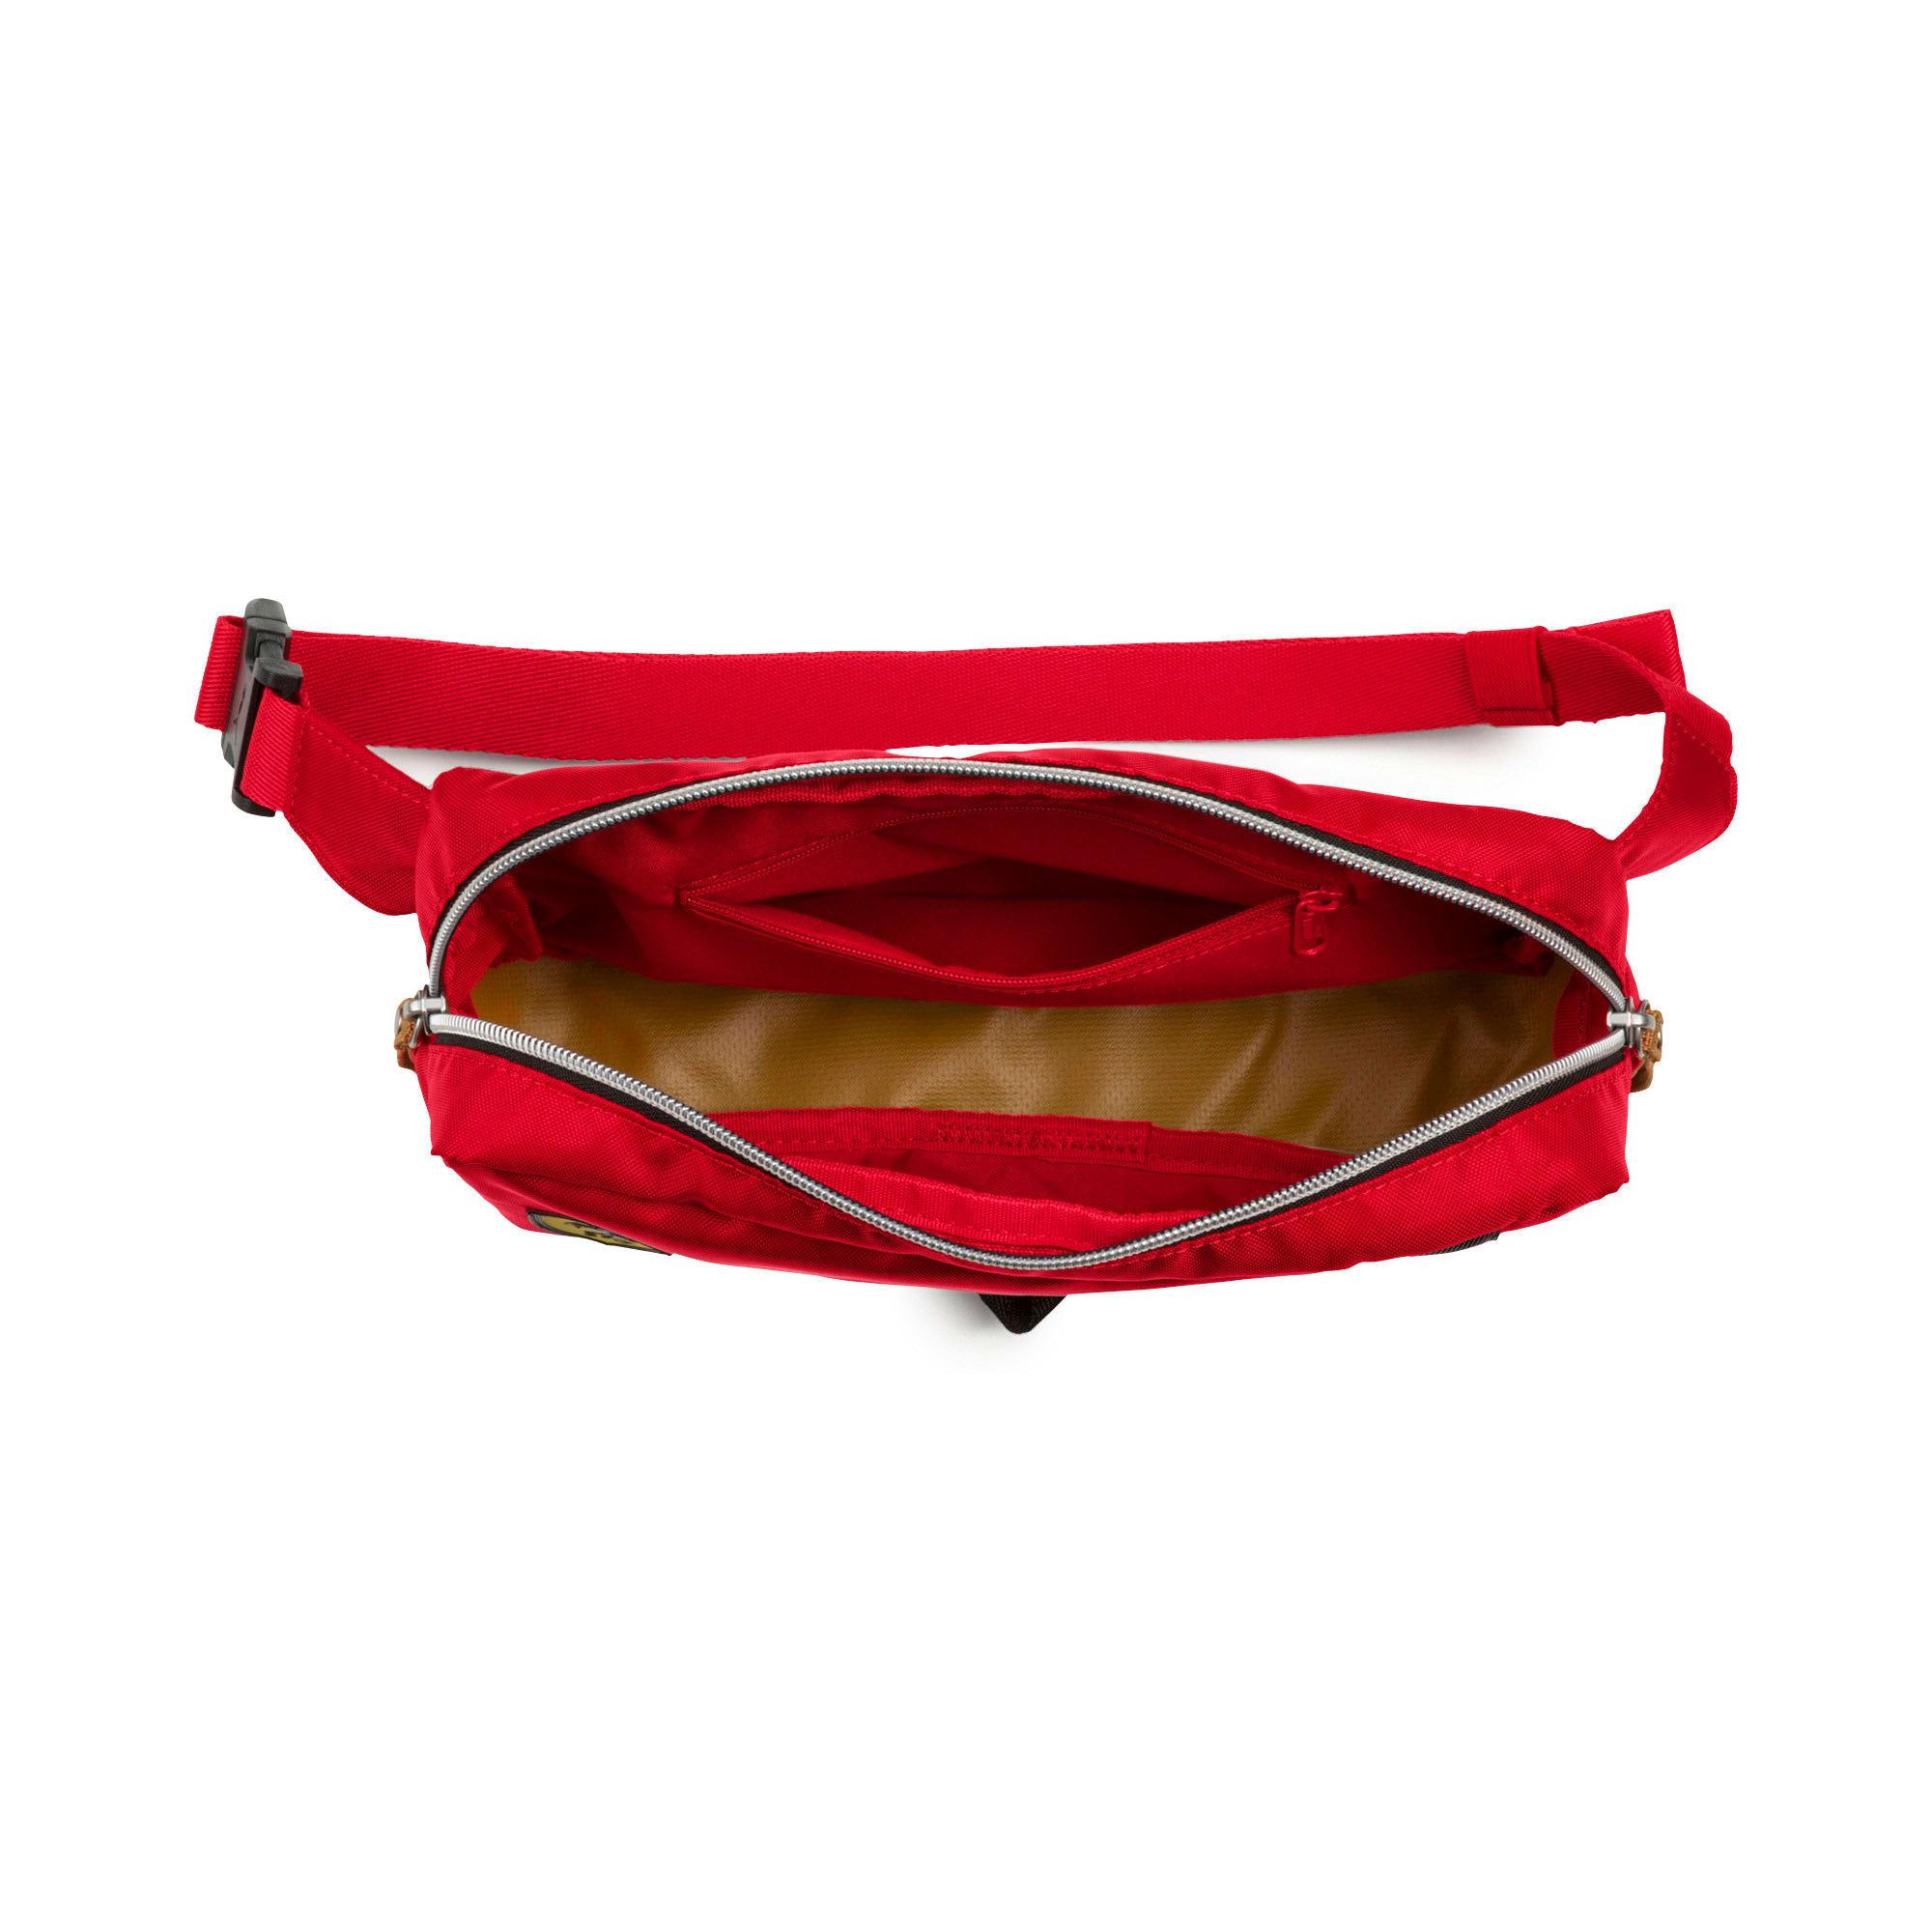 Thumbnail 3 of Scuderia Ferrari Fanwear Waist Bag, rosso corsa-Puma Black, medium